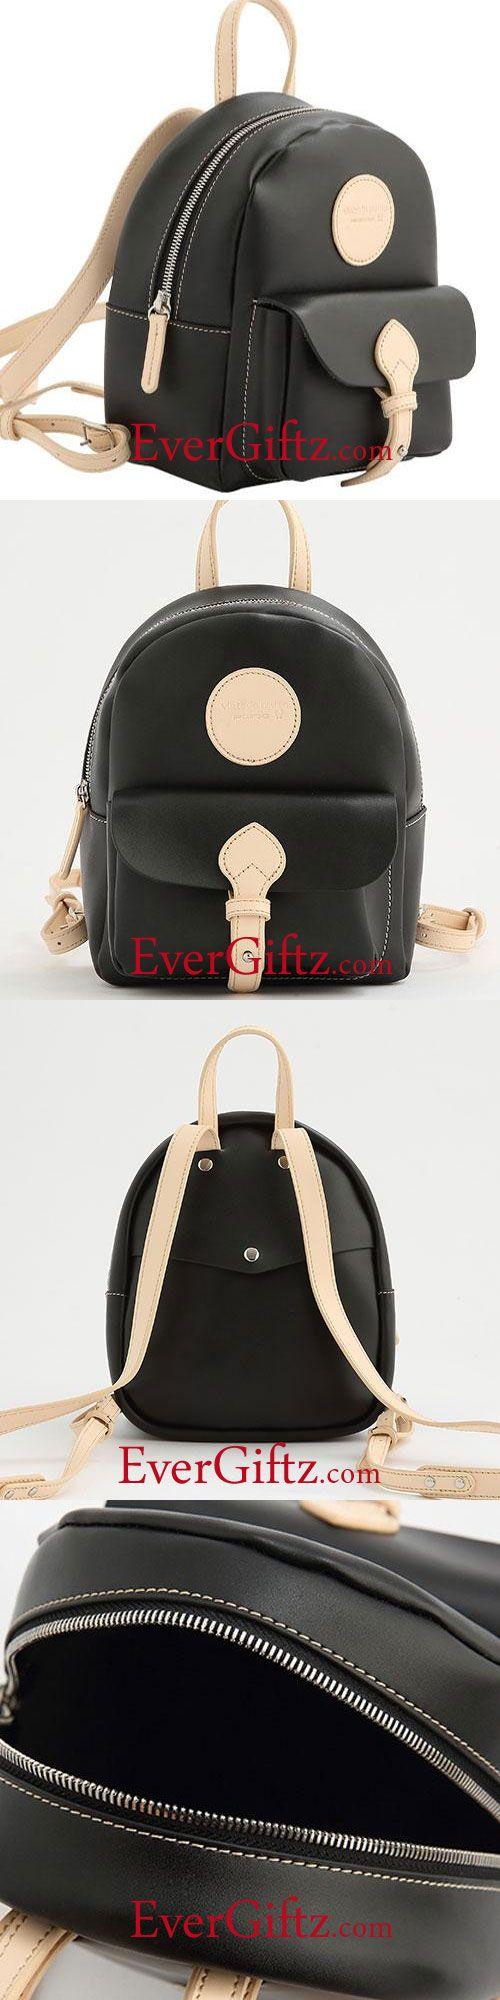 191fbe029424 Genuine Leather Backpack Women Girl Cute Black Small Bag Shoulder Bag  Handbag